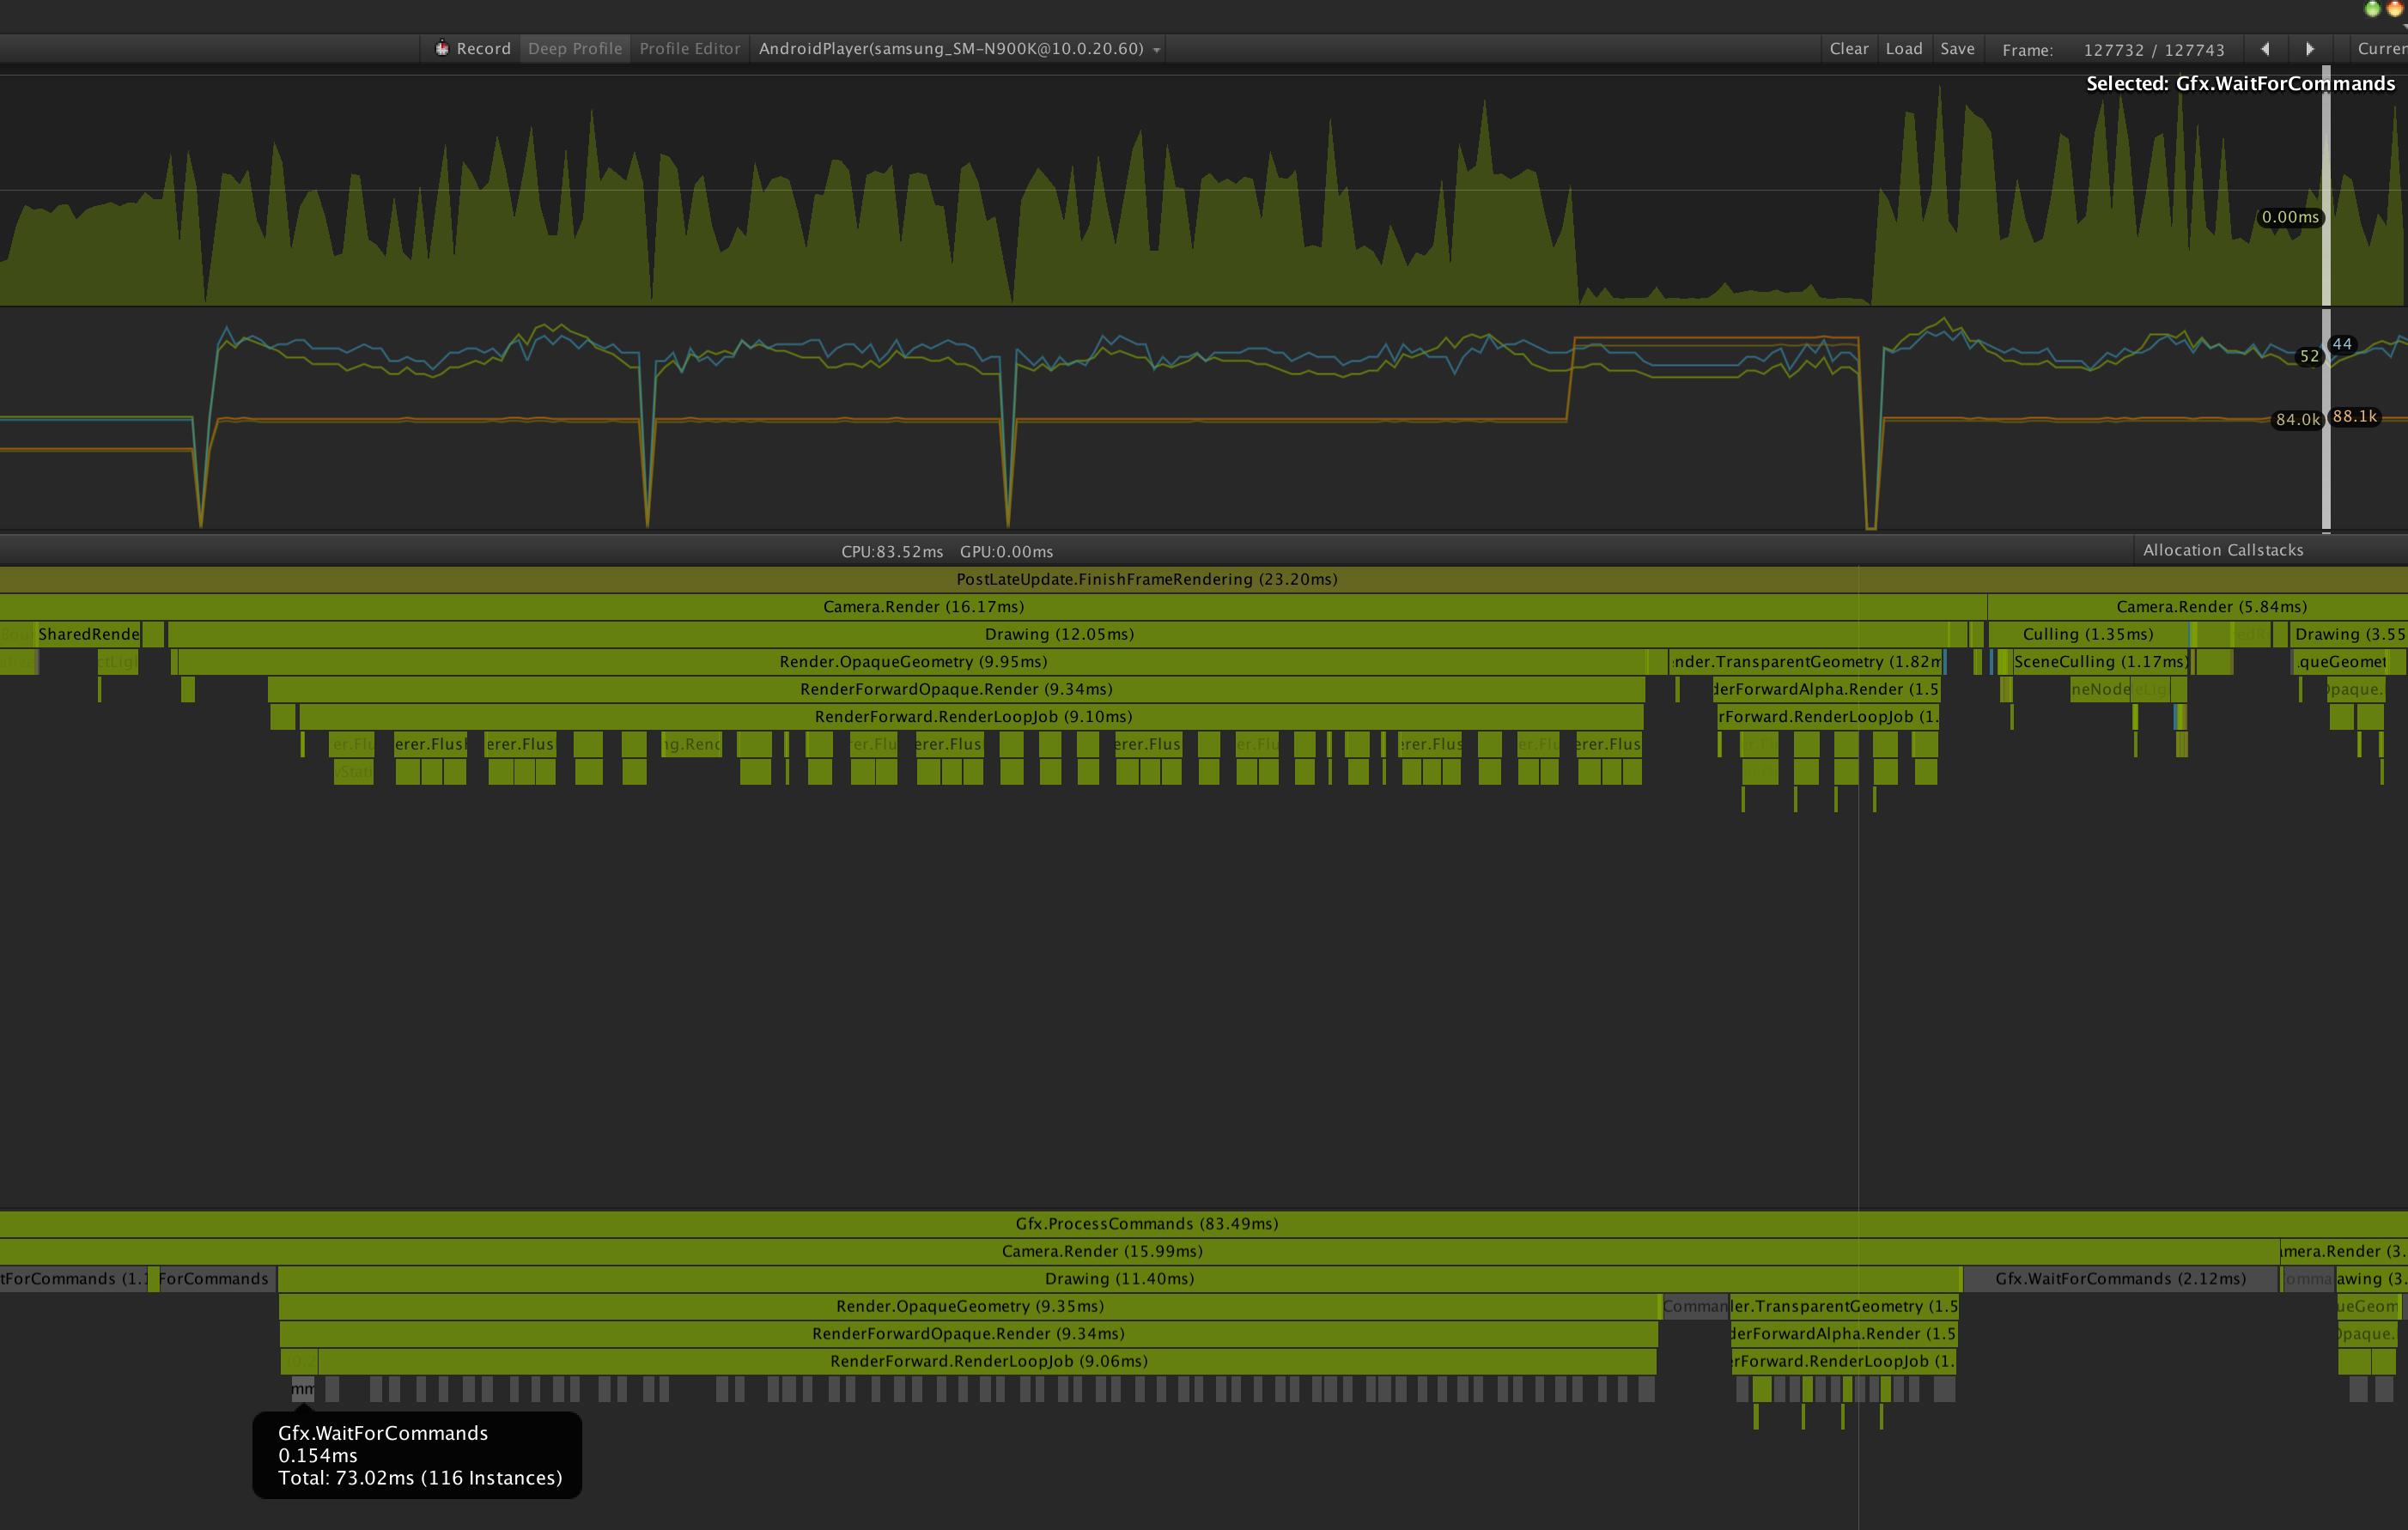 Graphics profiler GFX WaitForCommands, What is does it mean